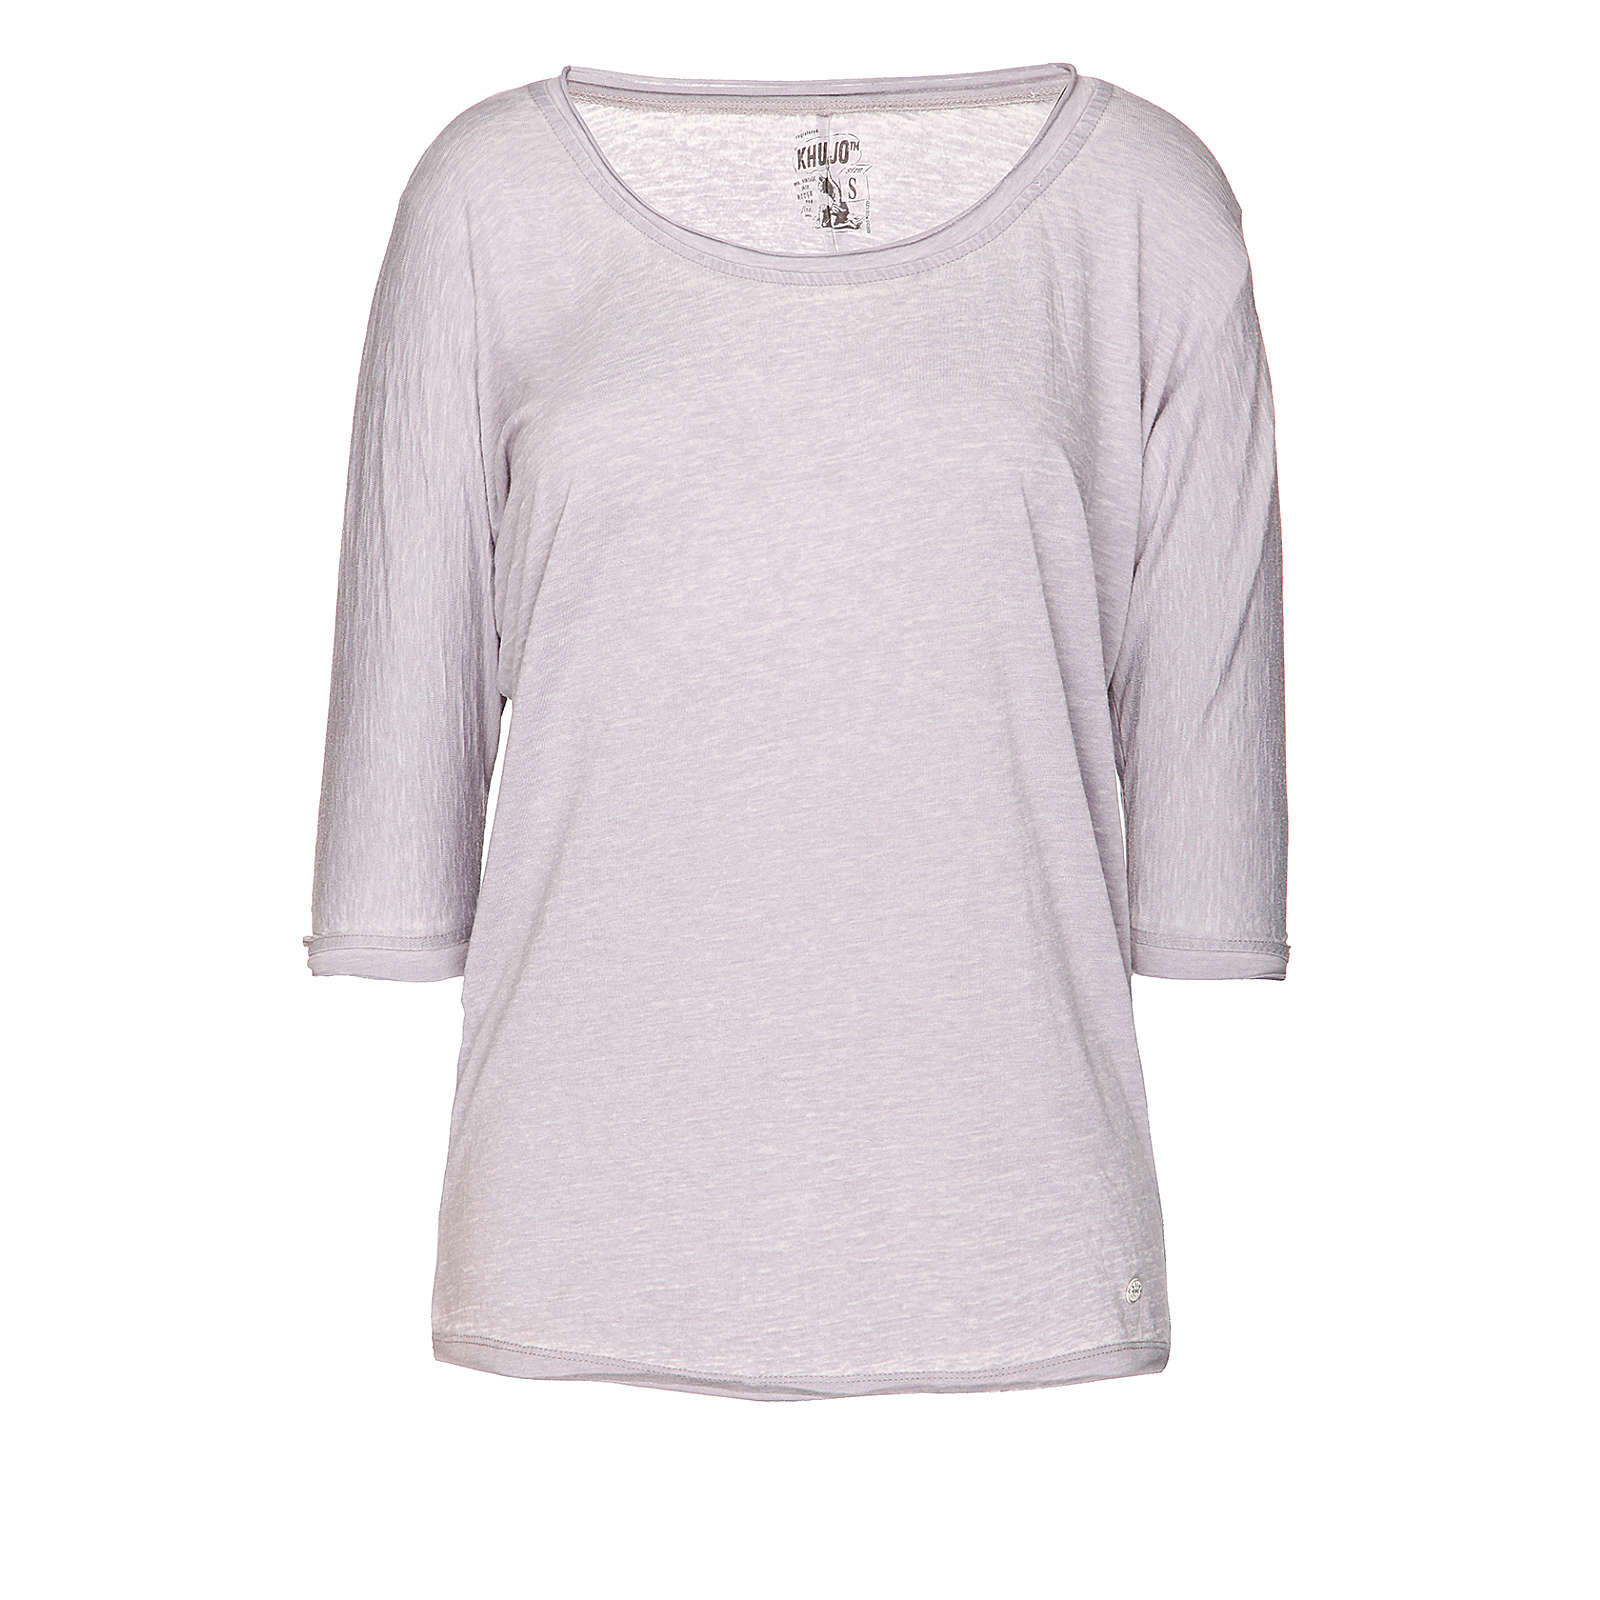 Khujo T-Shirt grau Damen Gr. 36